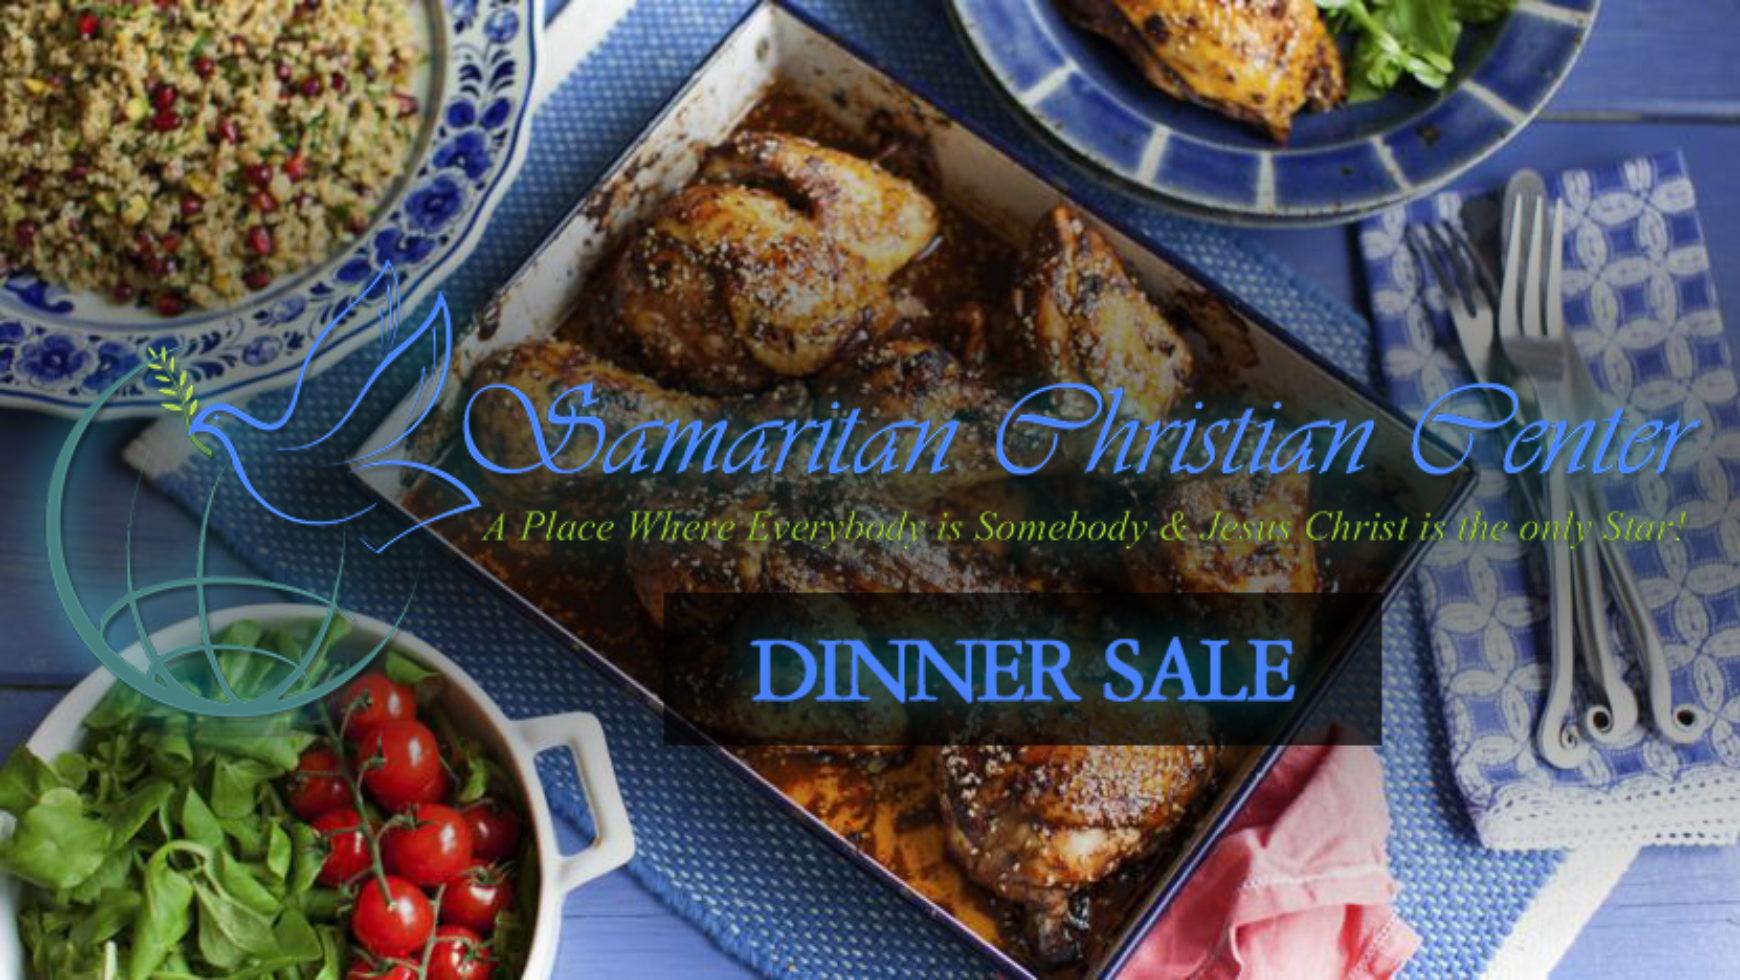 Samaritan Christian Center Dinner Sale